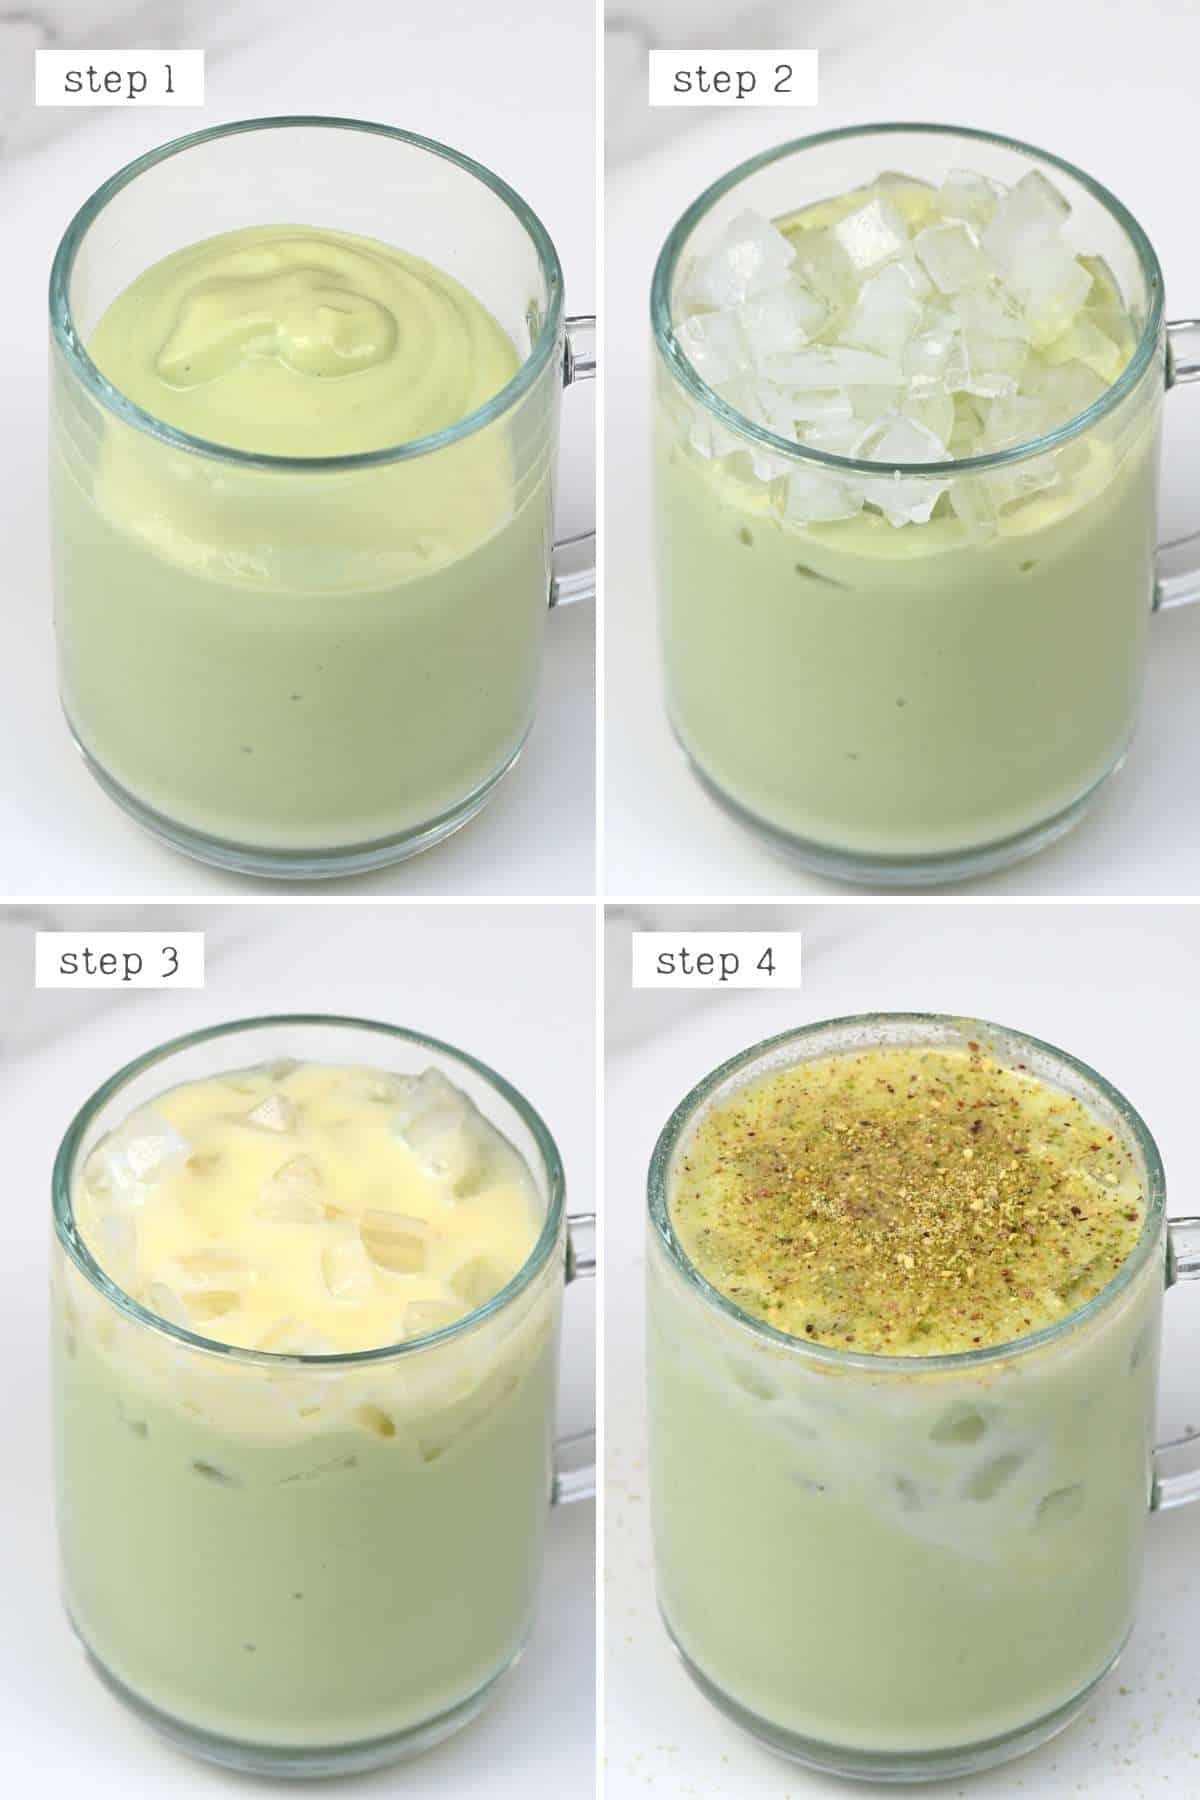 Steps for preparing avocado drink